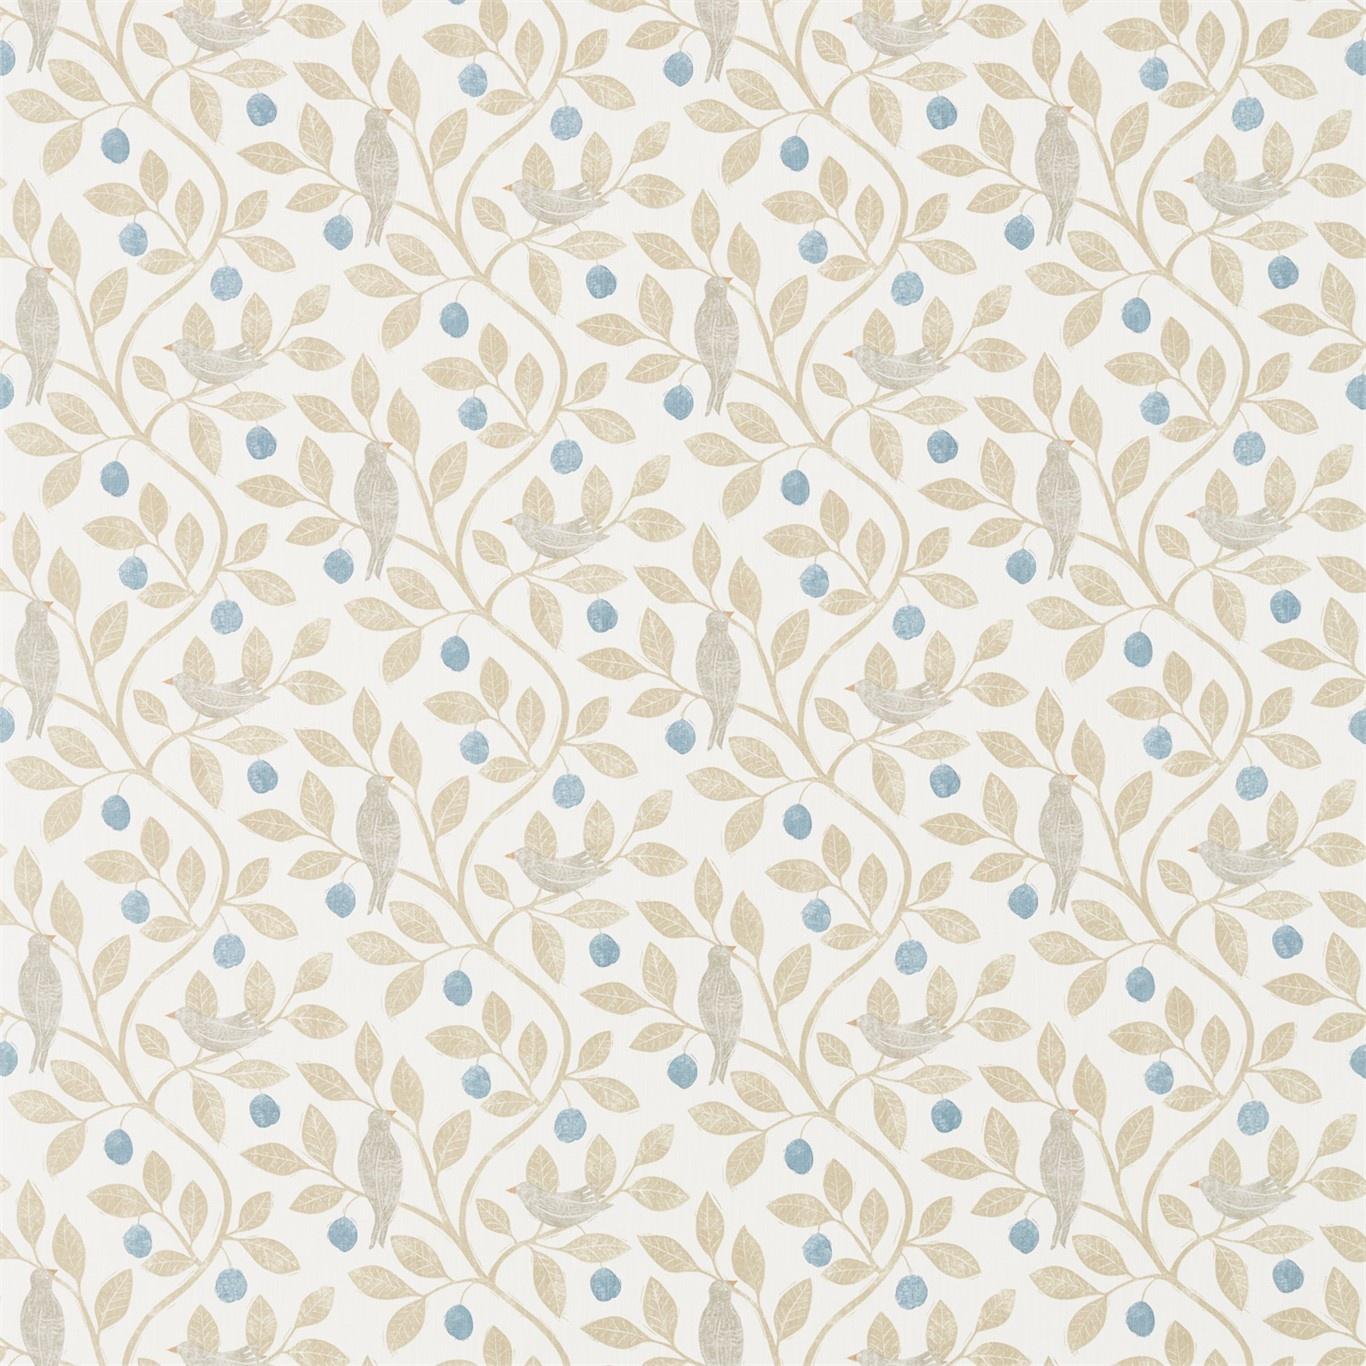 Image of Sanderson Home Damson Tree Denim/Barley Fabric 226361